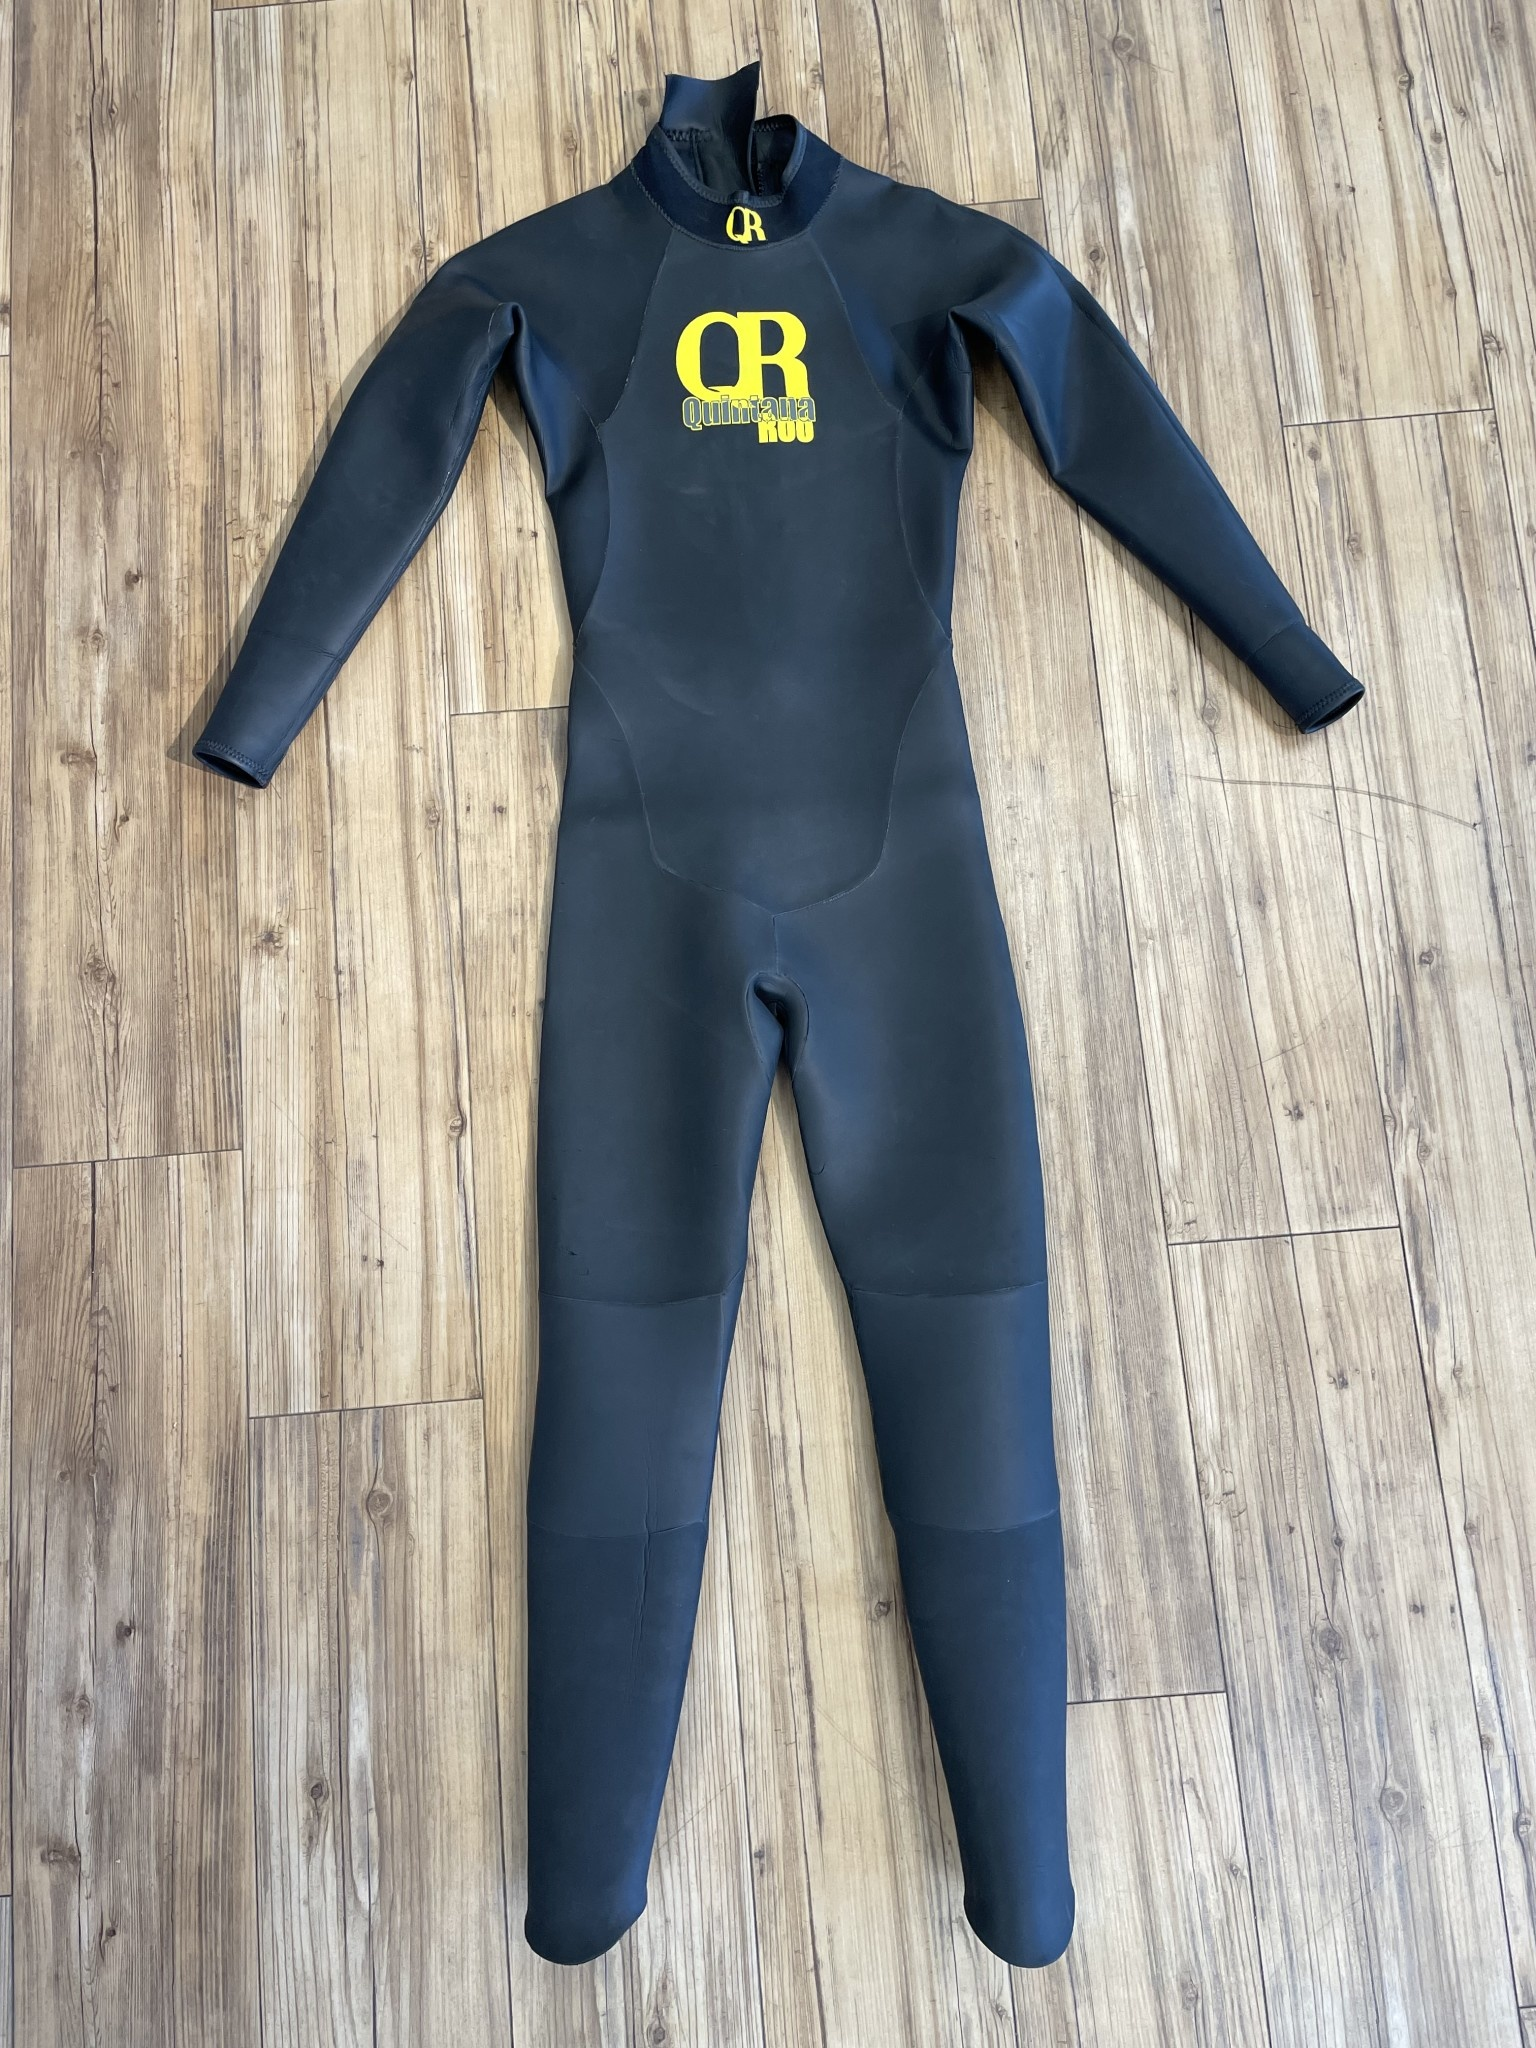 RESALE WETSUIT - Men's Quintana Roo Size S